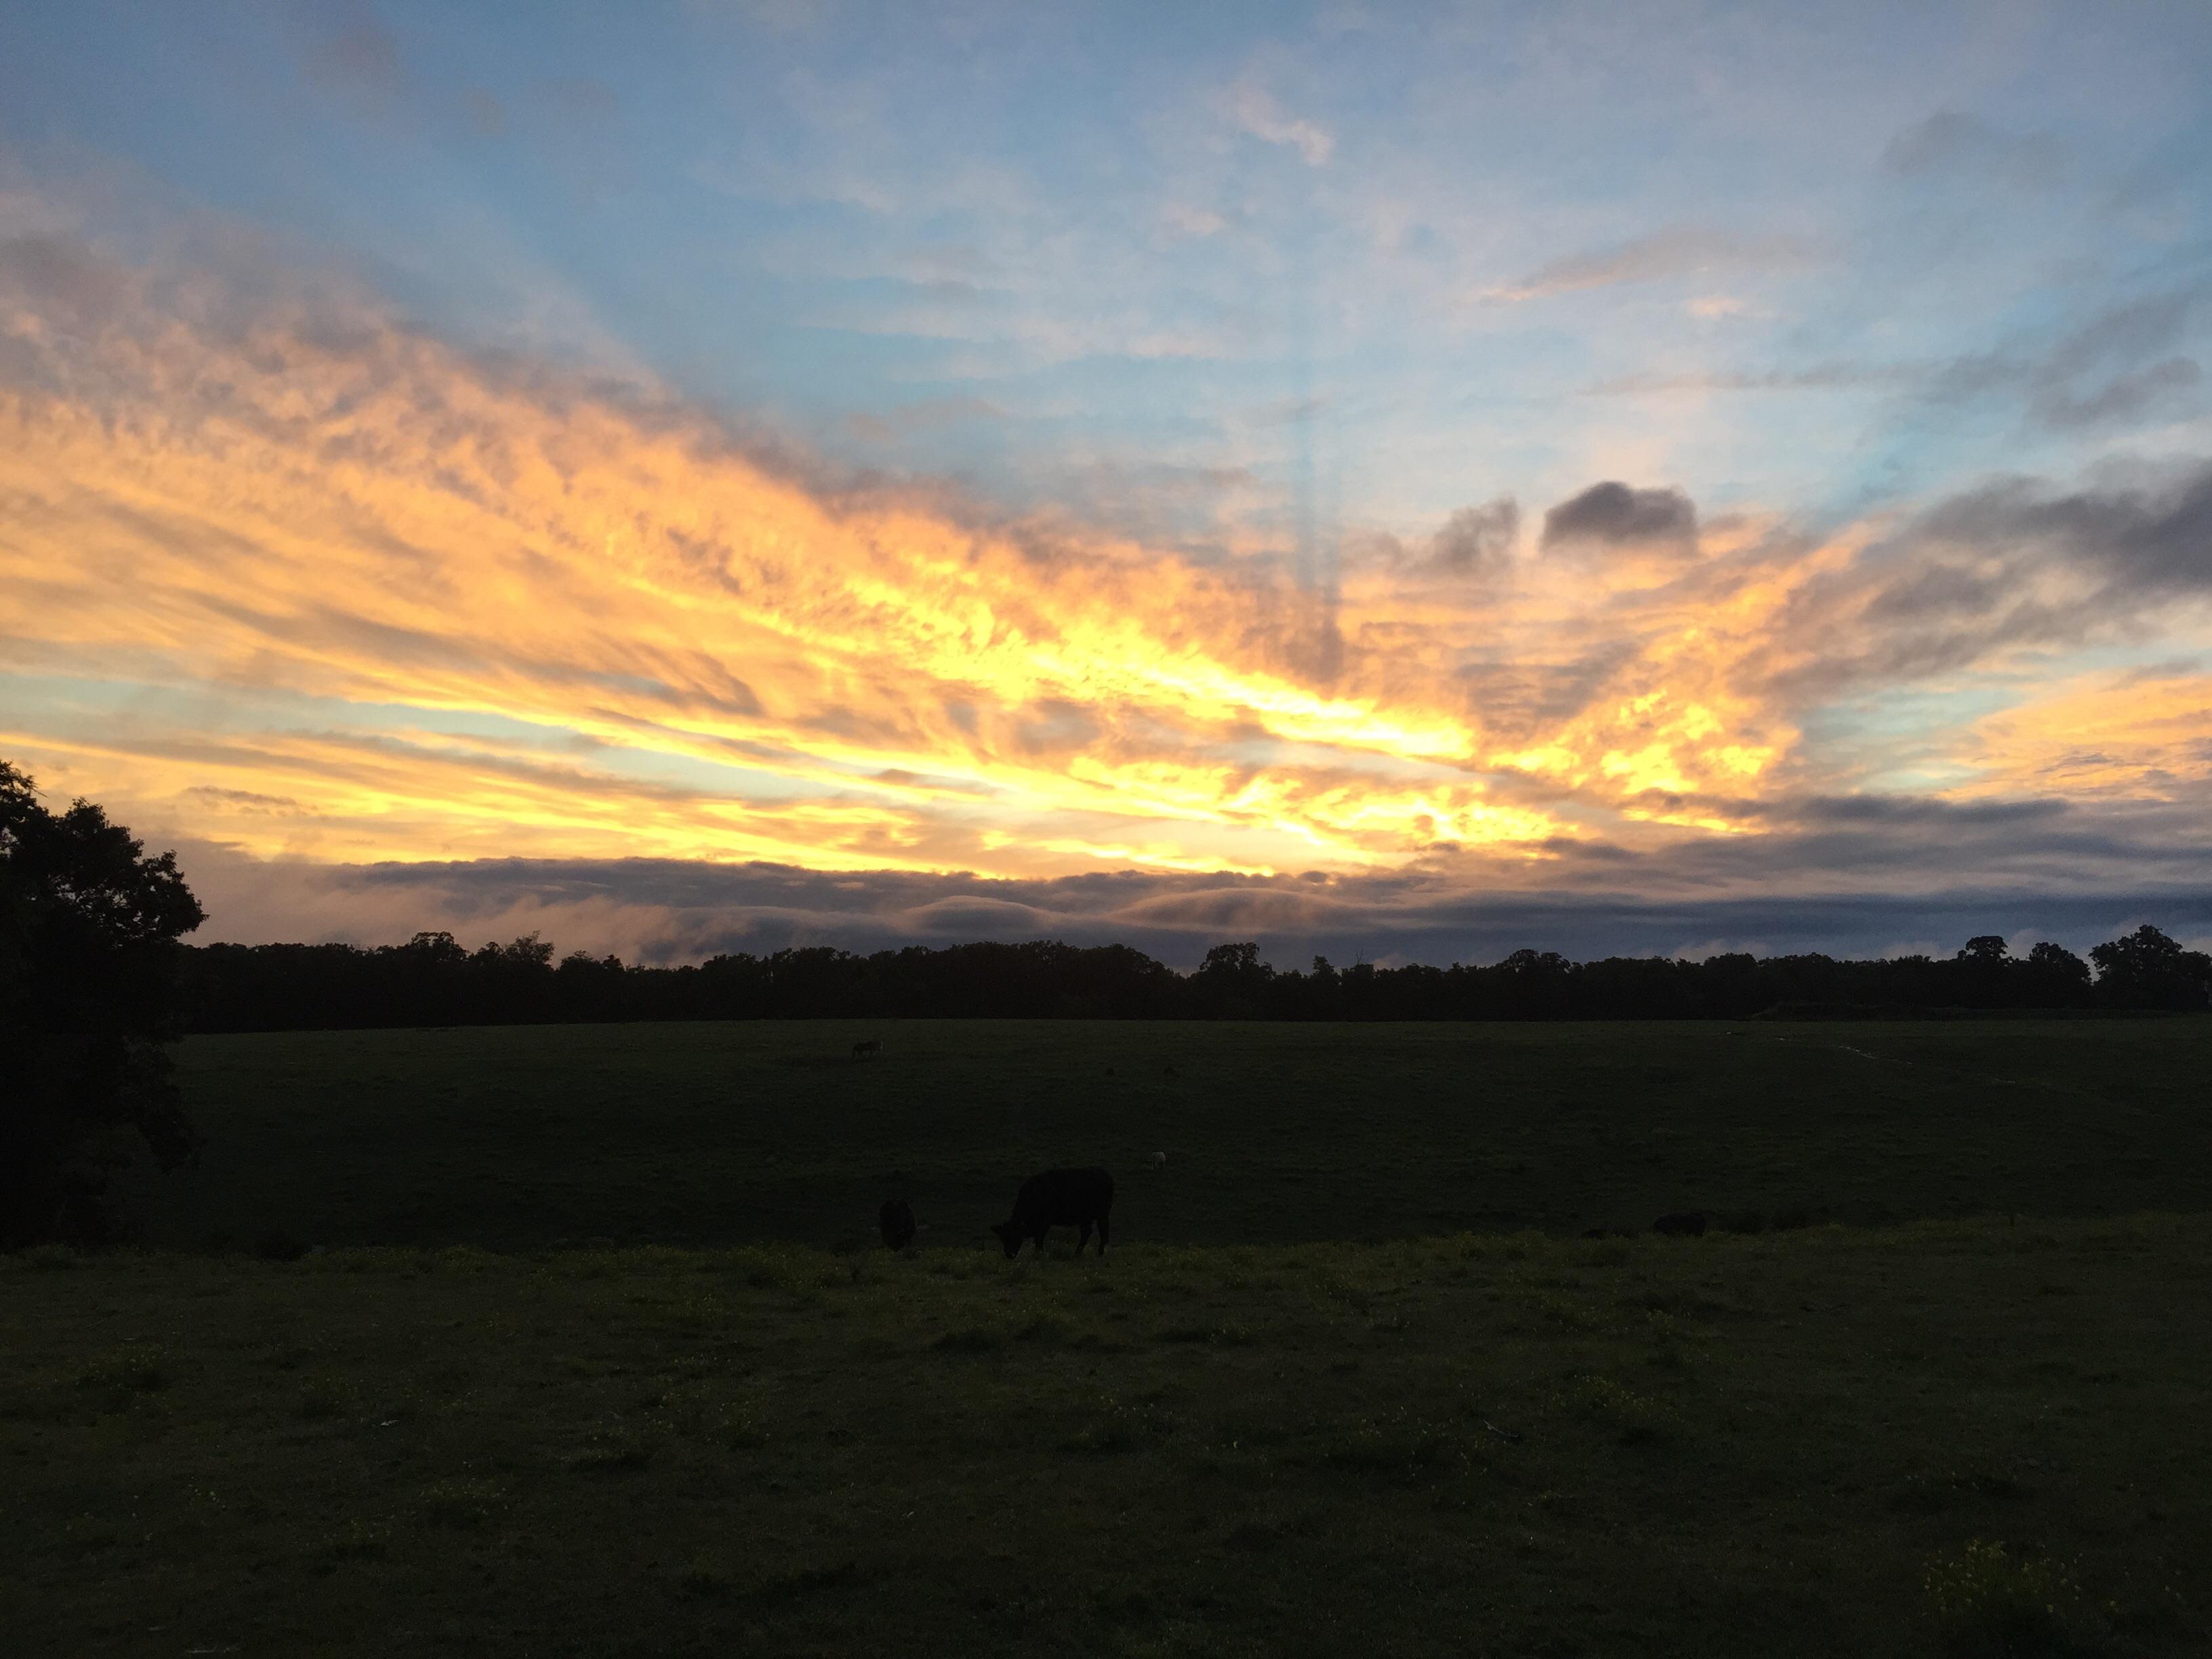 Sunset in Cedarville from 5NEWS viewer Kassie Jenkins